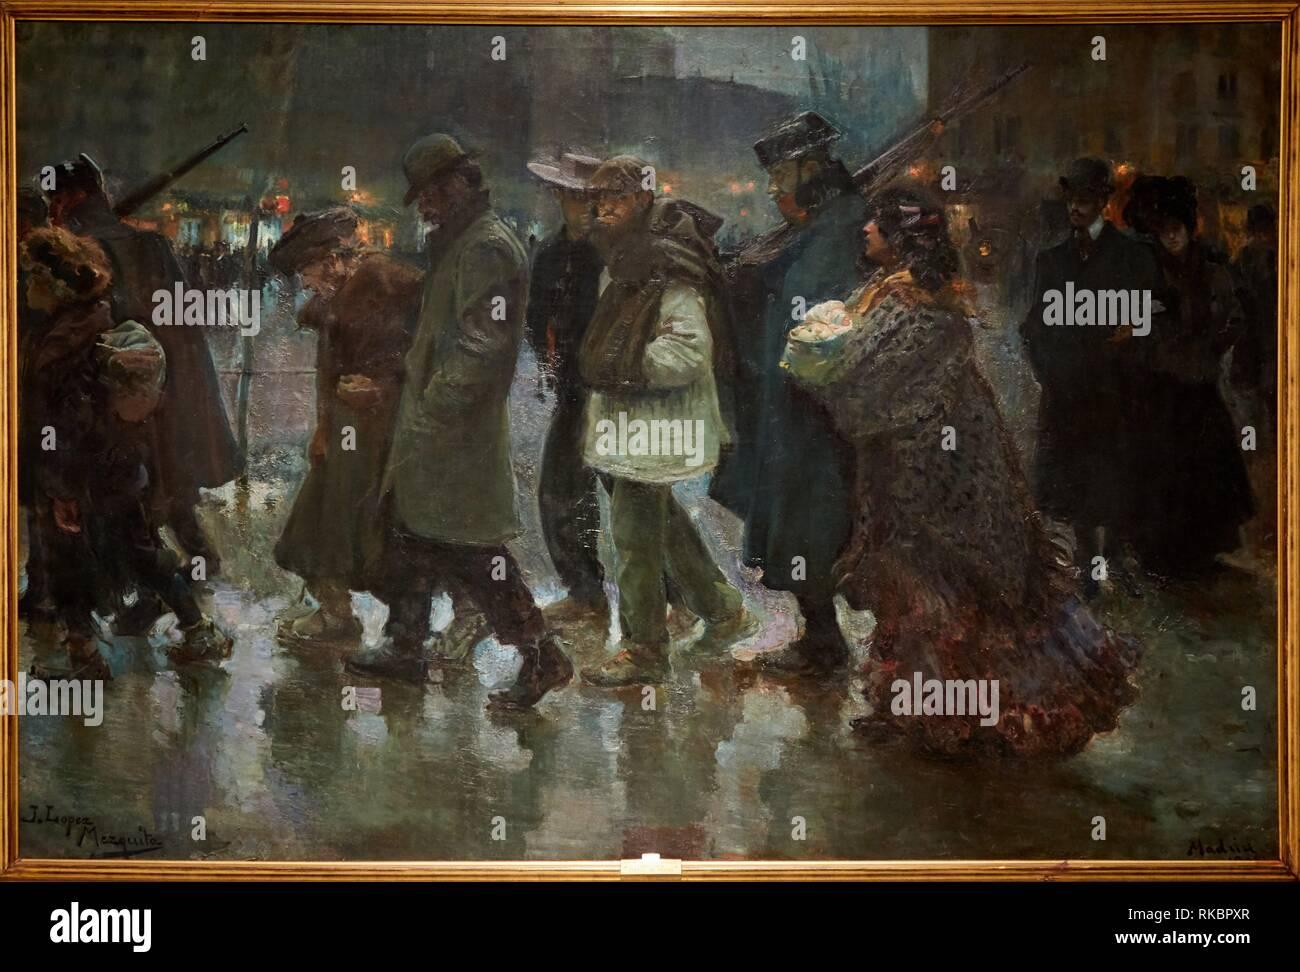 Chain Gang, 1901, José María López Mezquita, Museo Nacional Centro de Arte Reina Sofia, Madrid, Spain, Europe - Stock Image